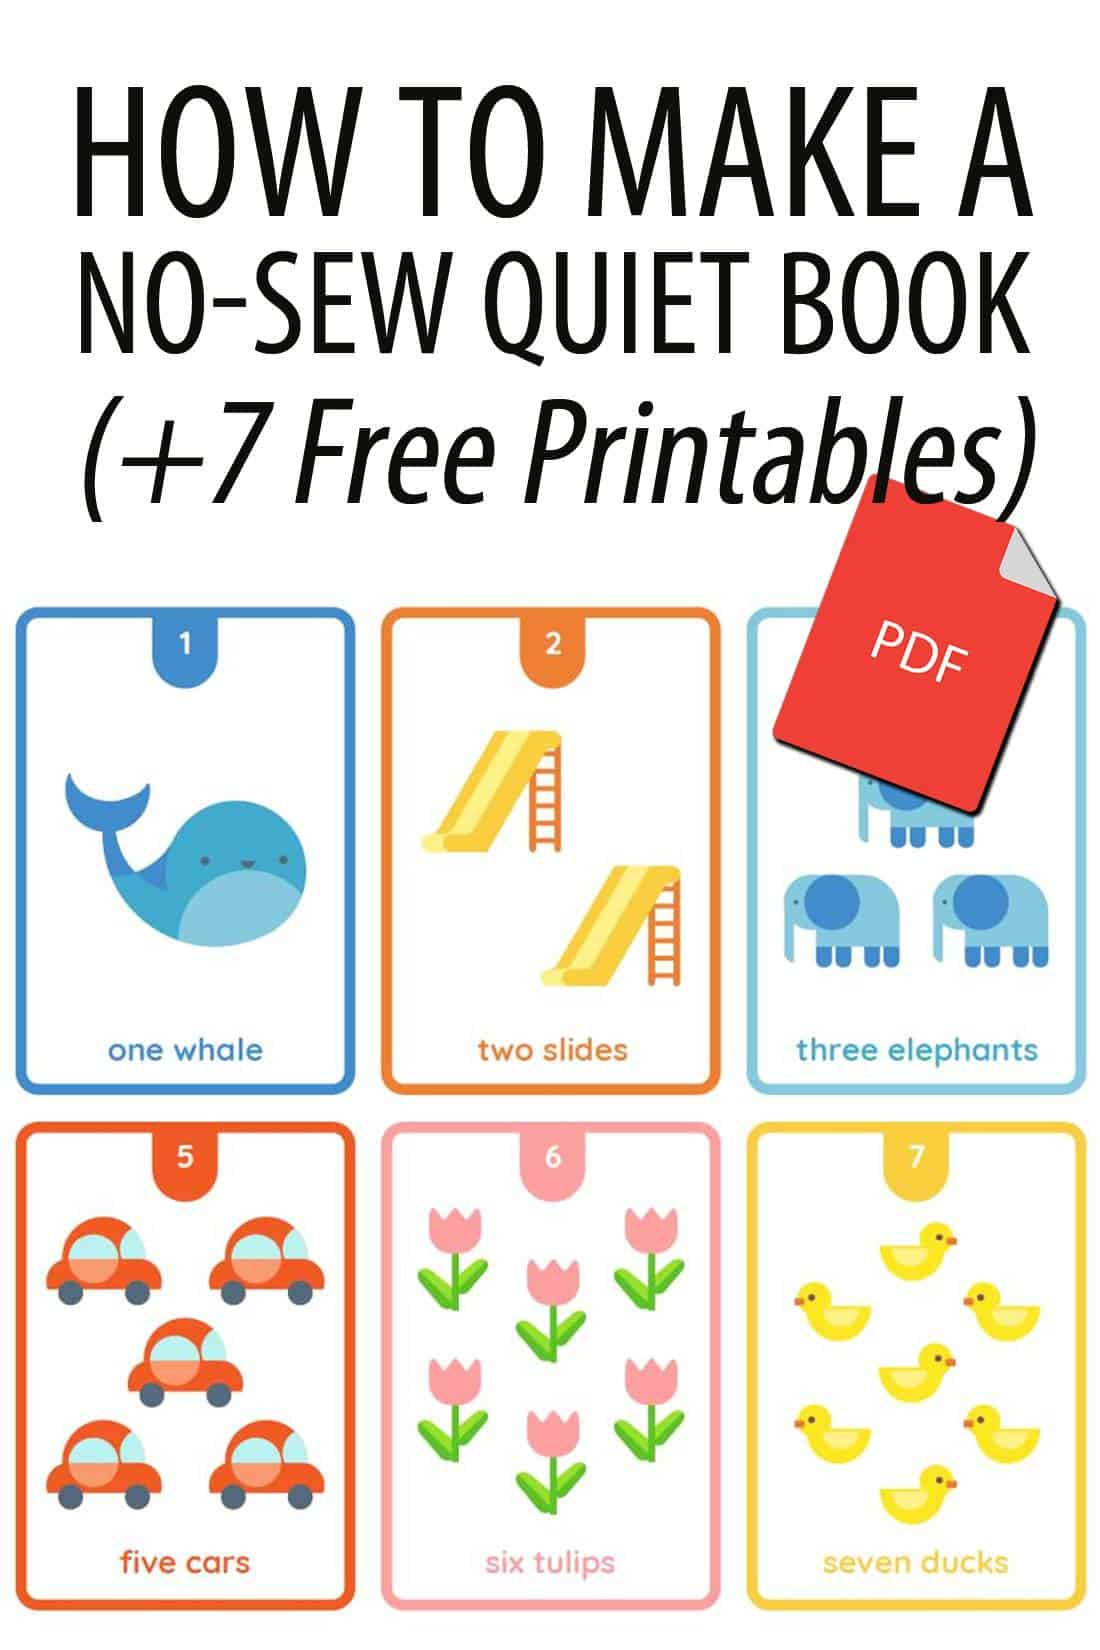 no-sew quiet book Pinterest image